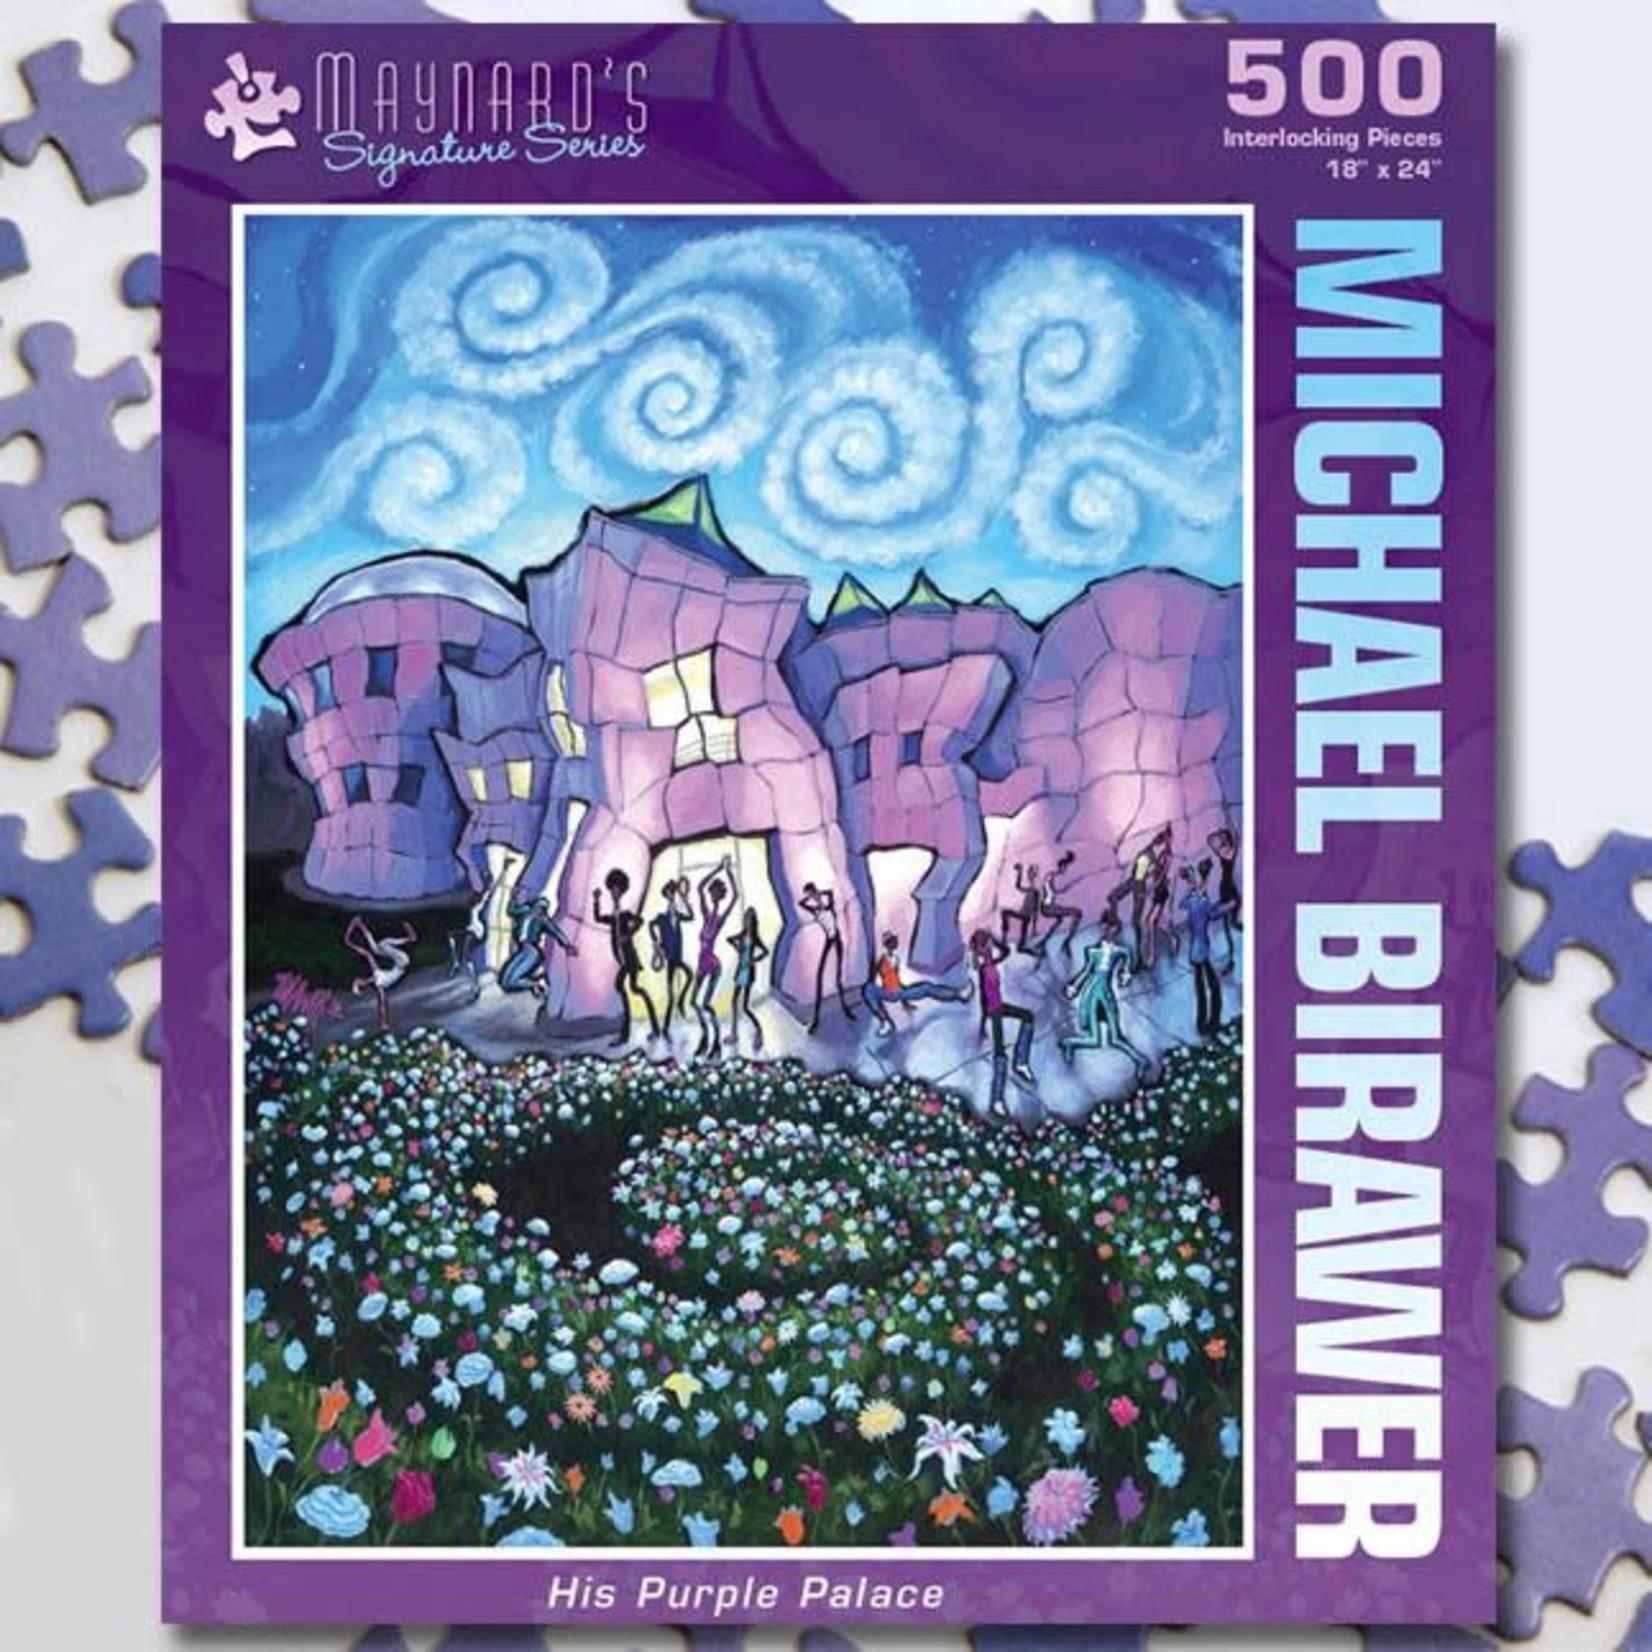 Puzzle Twist Maynard's Signature Series - 500 Piece Puzzle: His Purple Palace